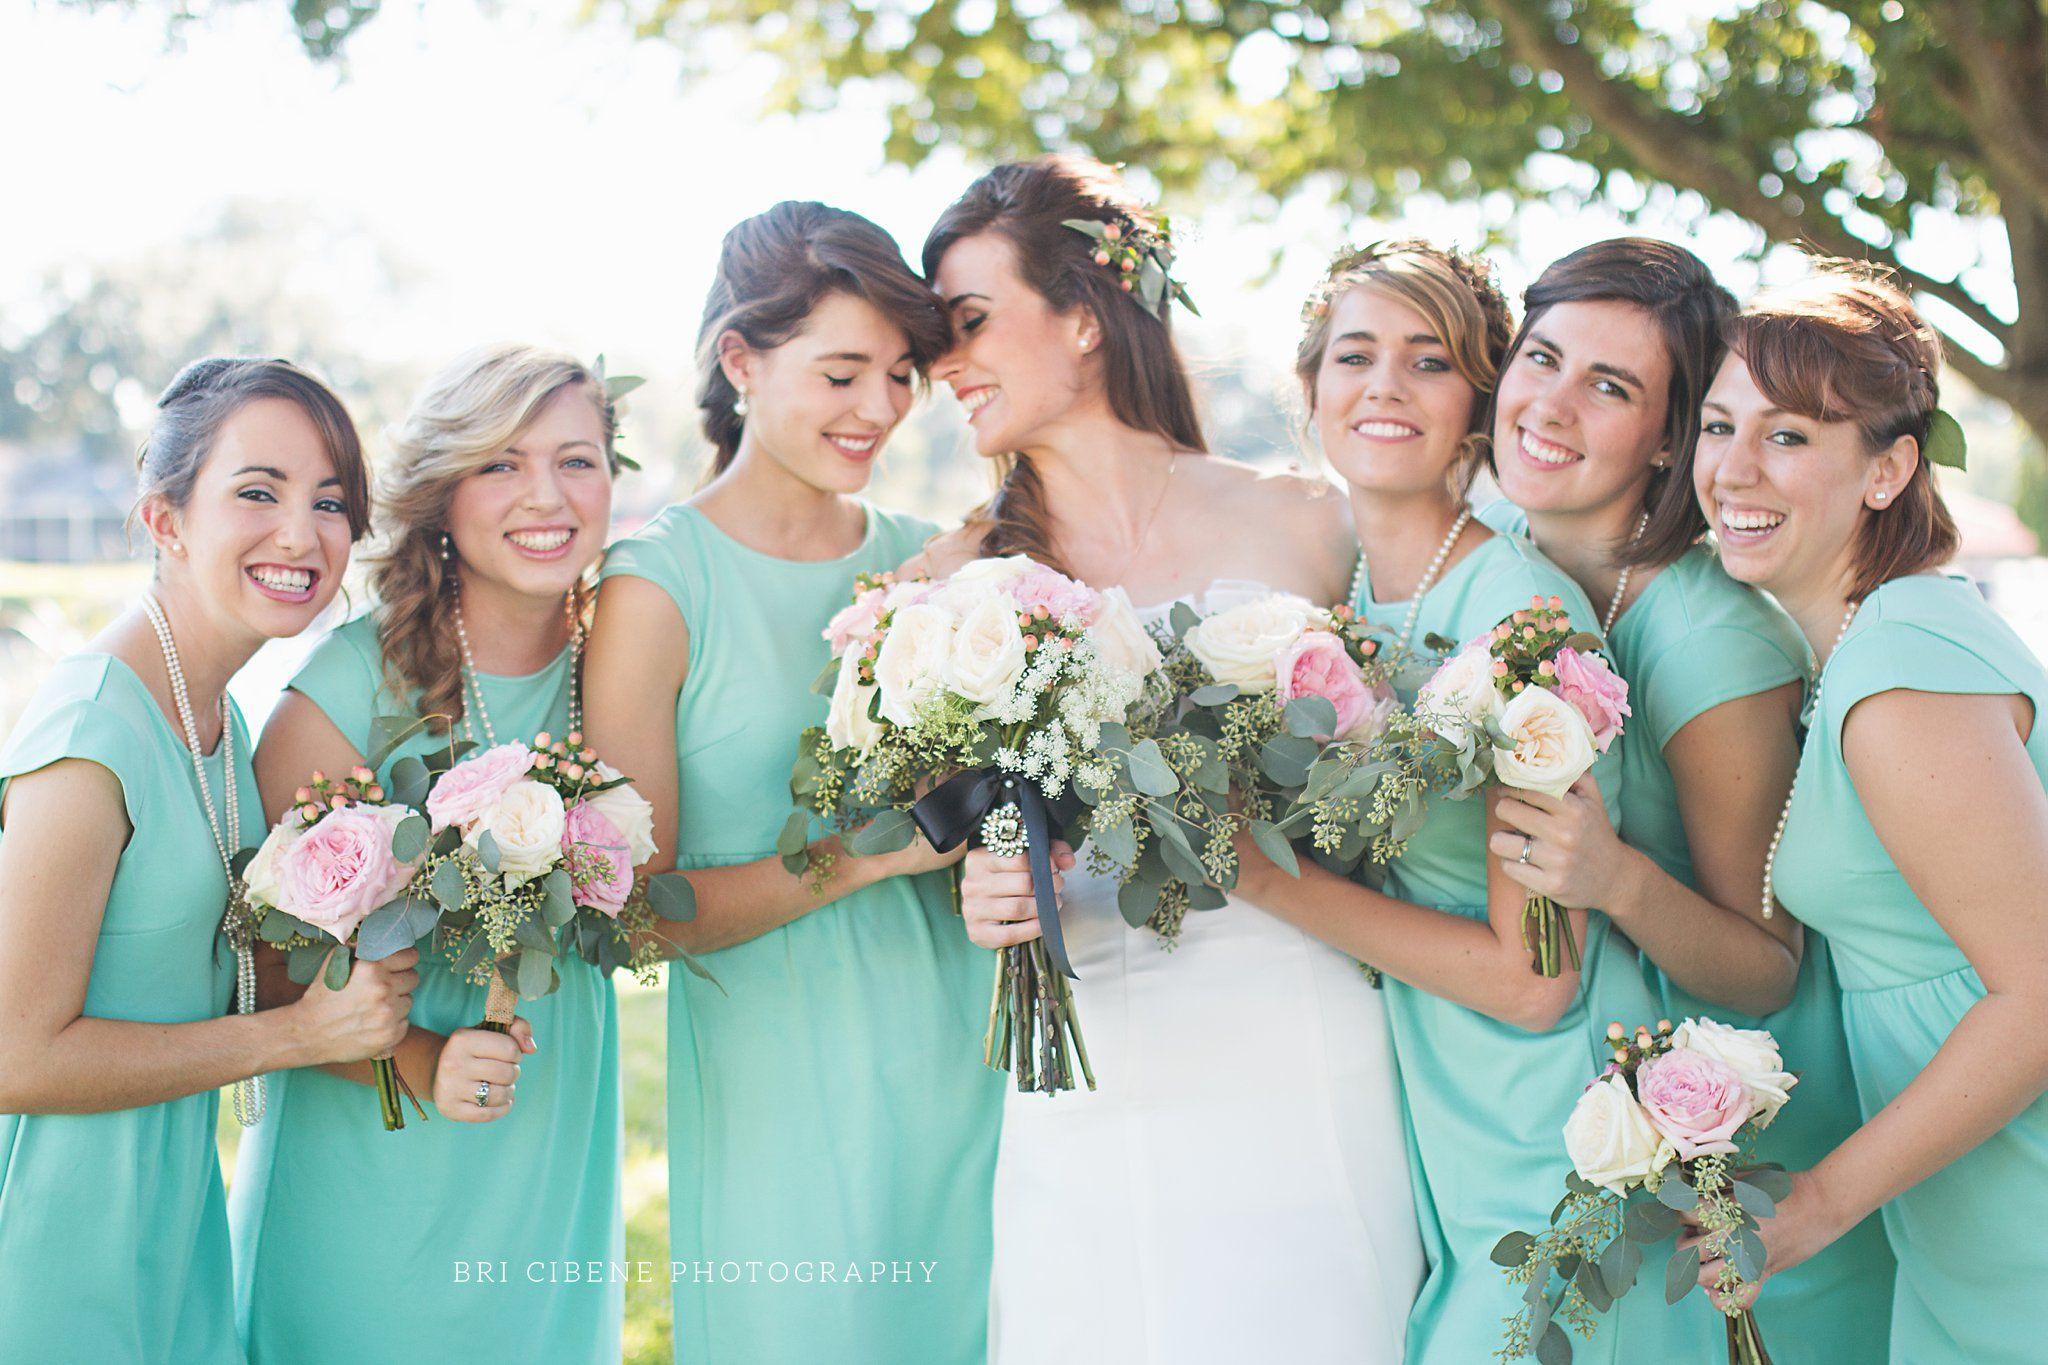 Wedding dresses lakeland fl  beautiful teal bridesmaid dresses  Bri Cibene Design u Photography